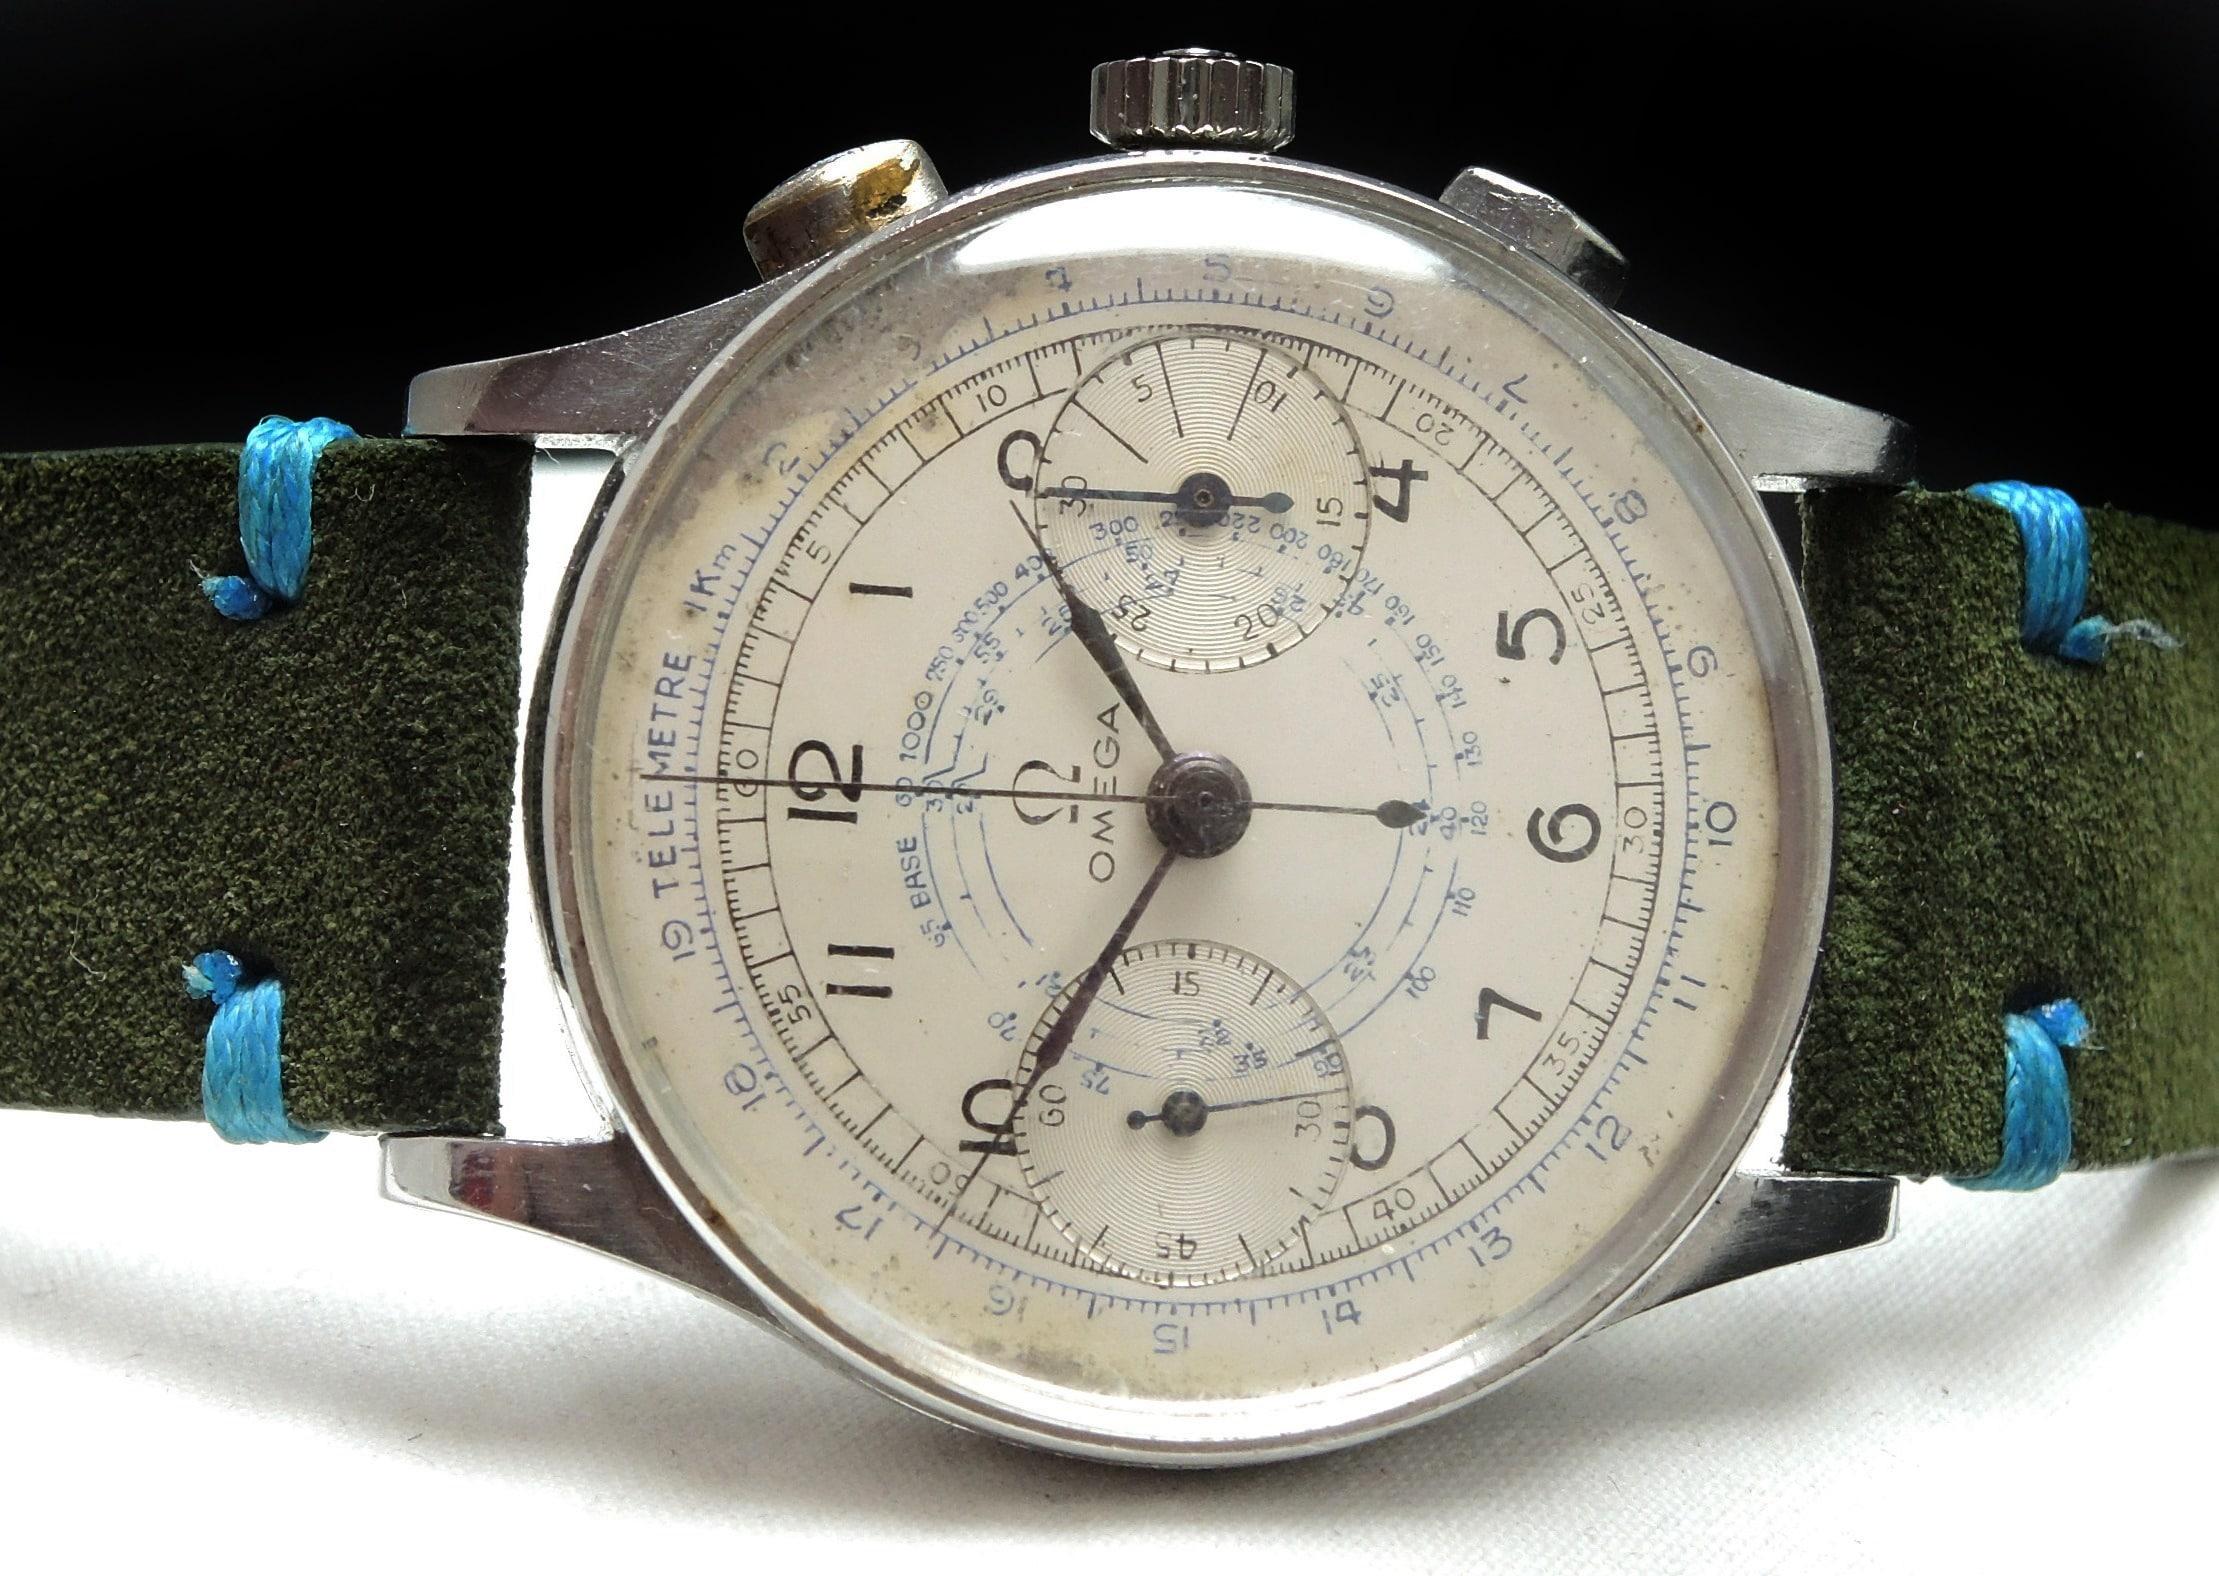 Professionally Serviced Vintage Omega Cal 33.3 Chronograph